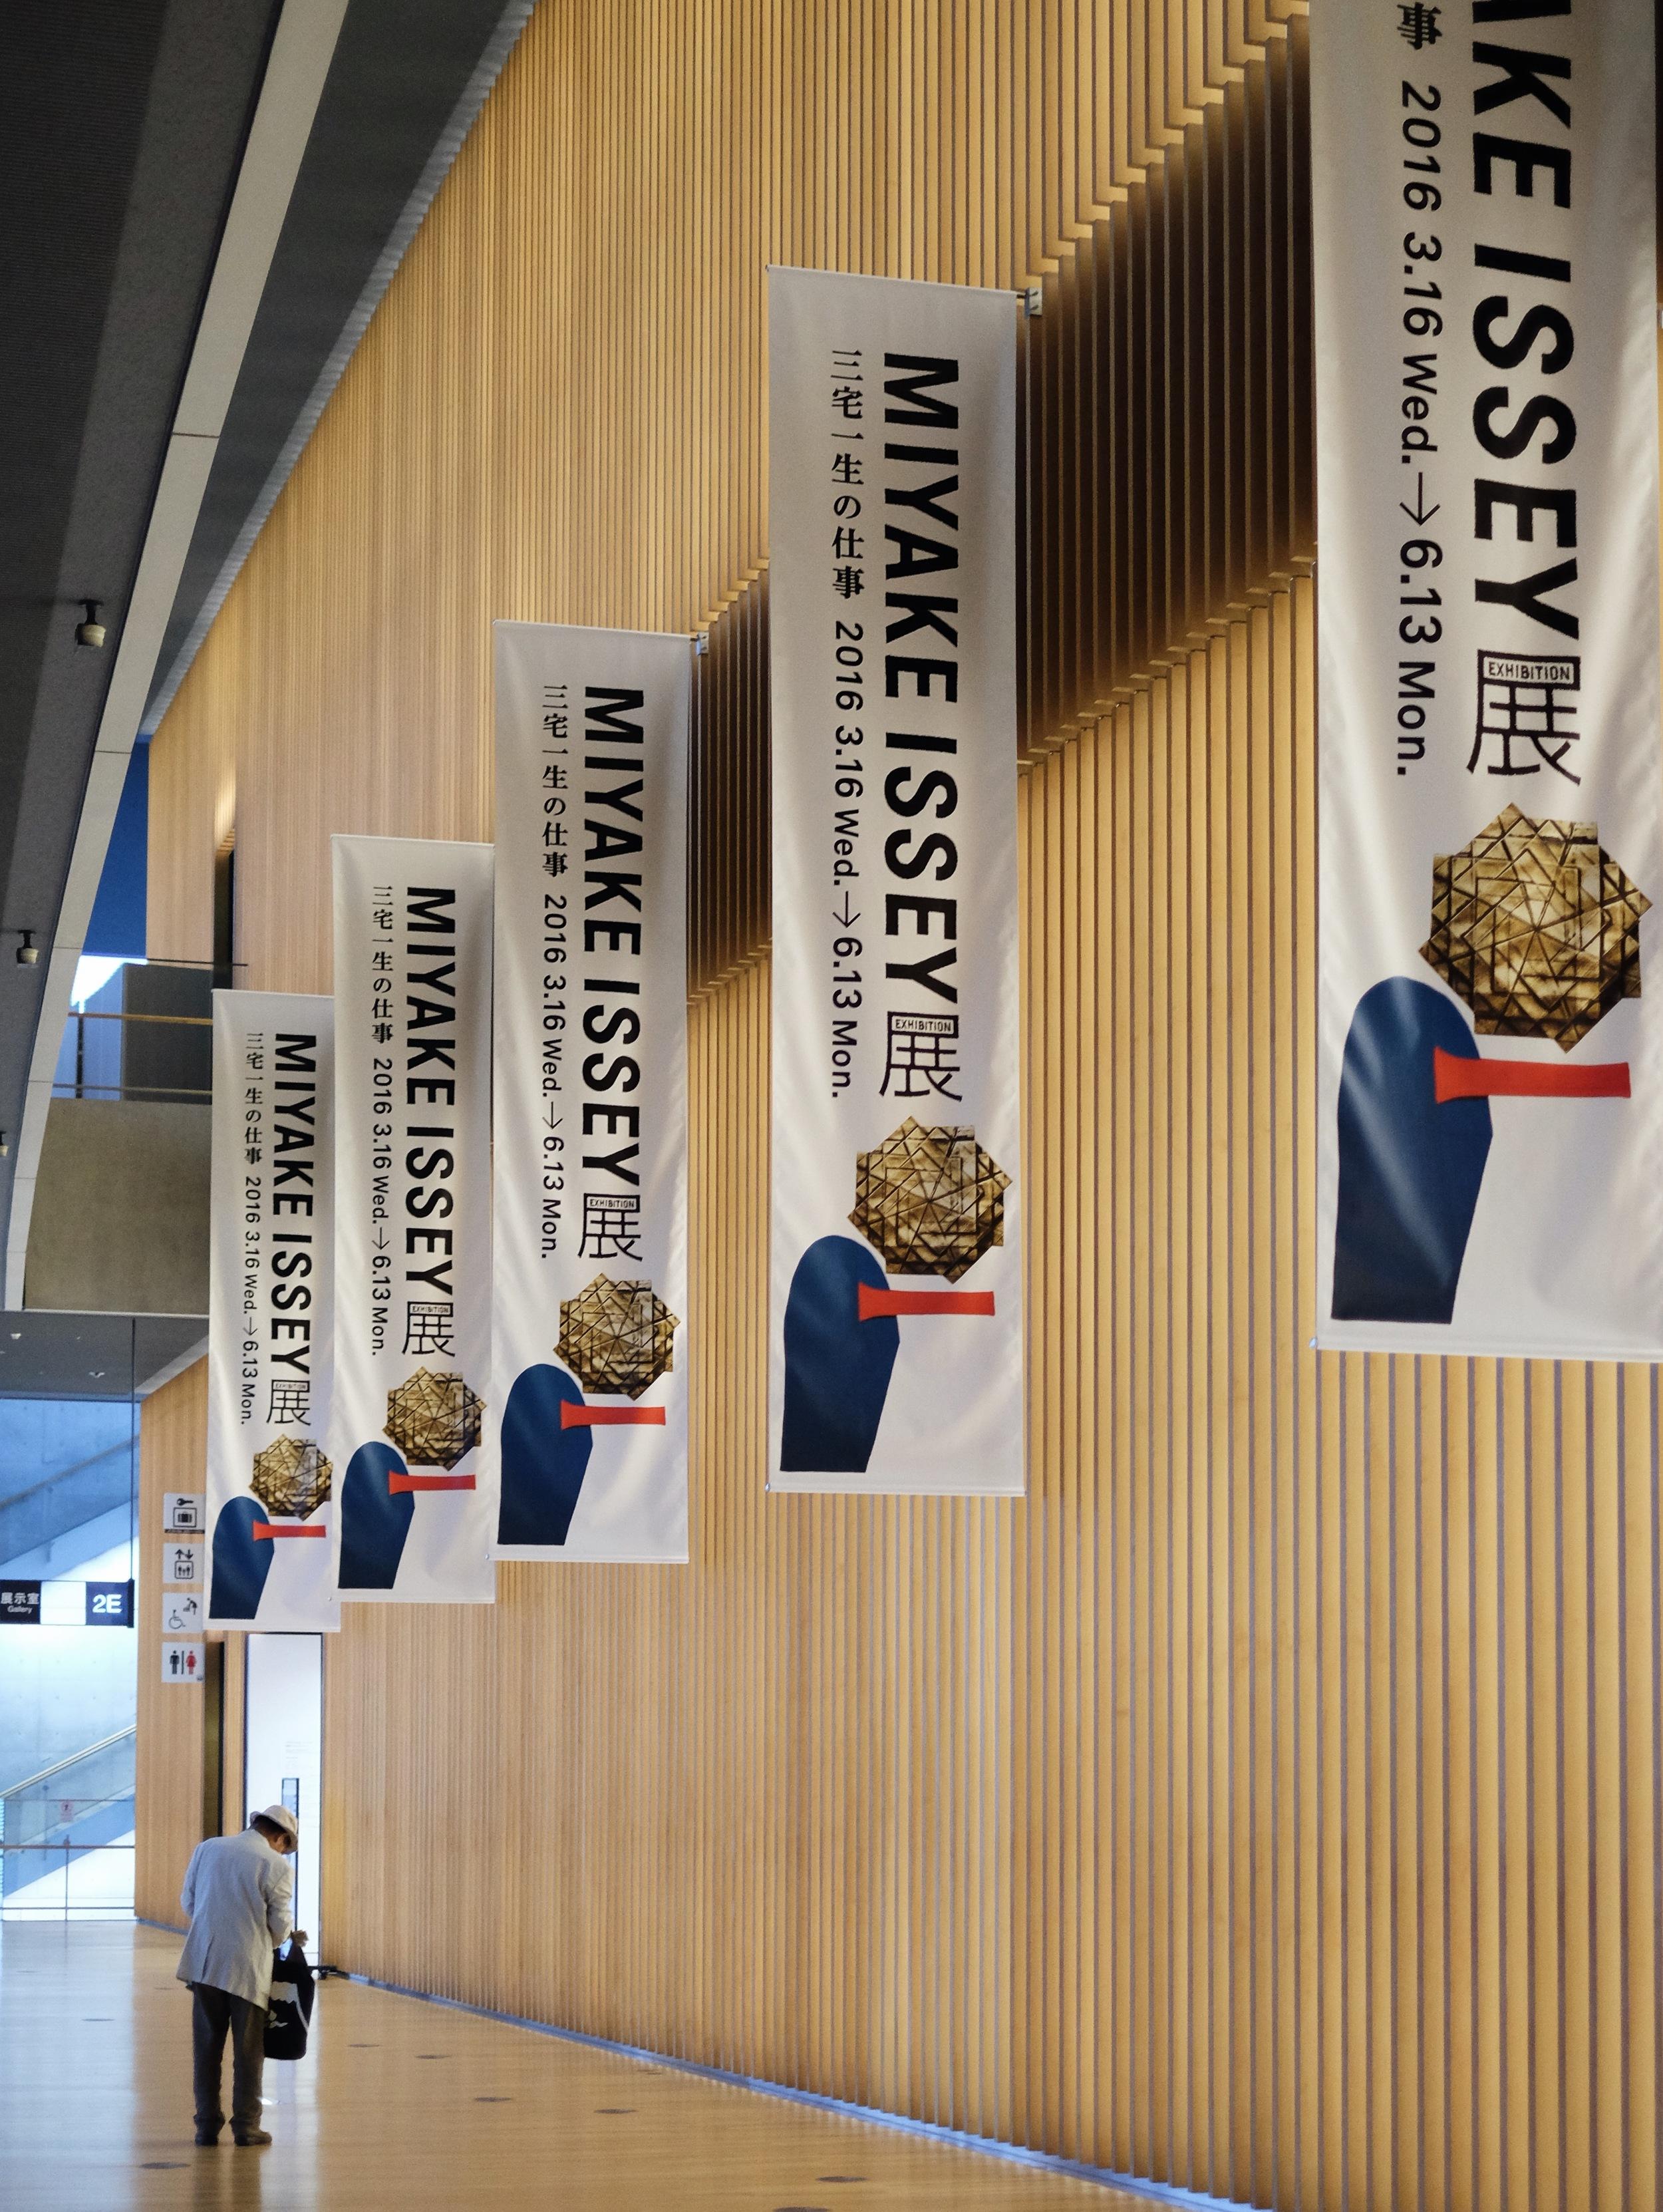 Issey Miyake Exhibit at   The National Art Center Tokyo  .